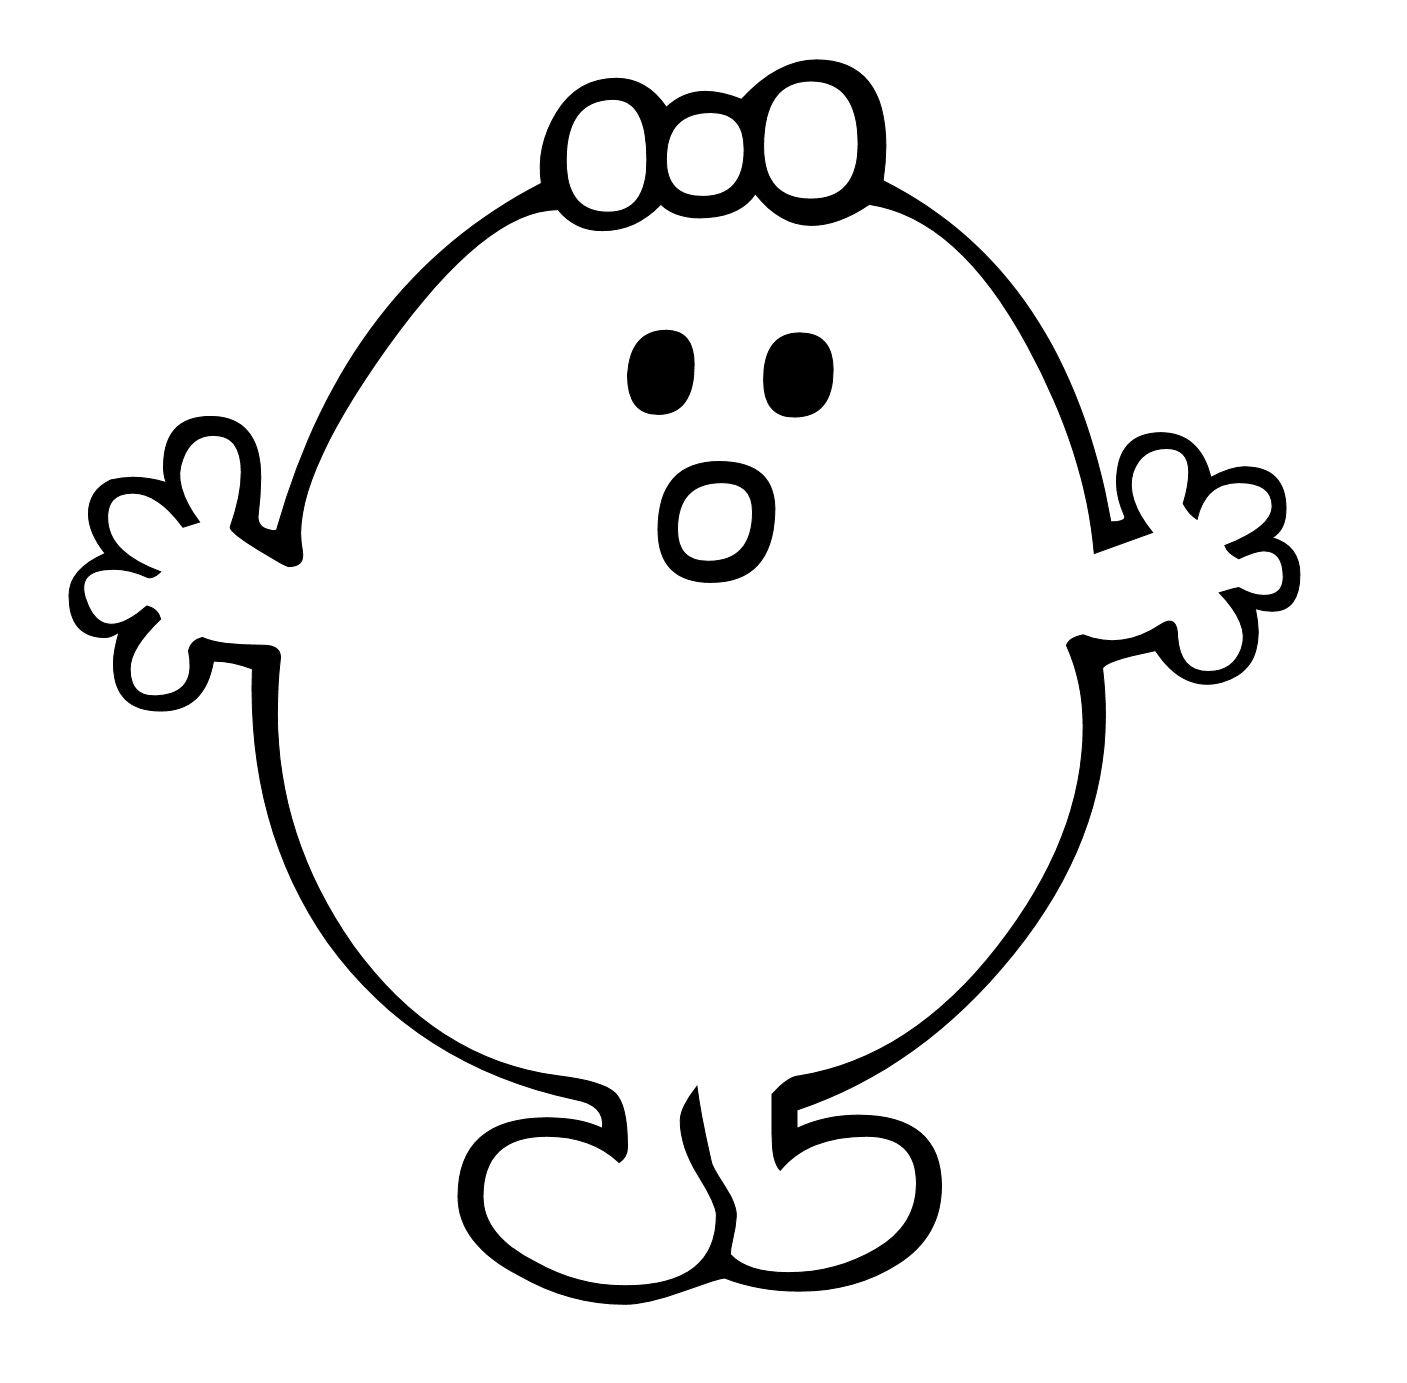 Five Senses Mr Potato Head Printable Sketch Coloring Page